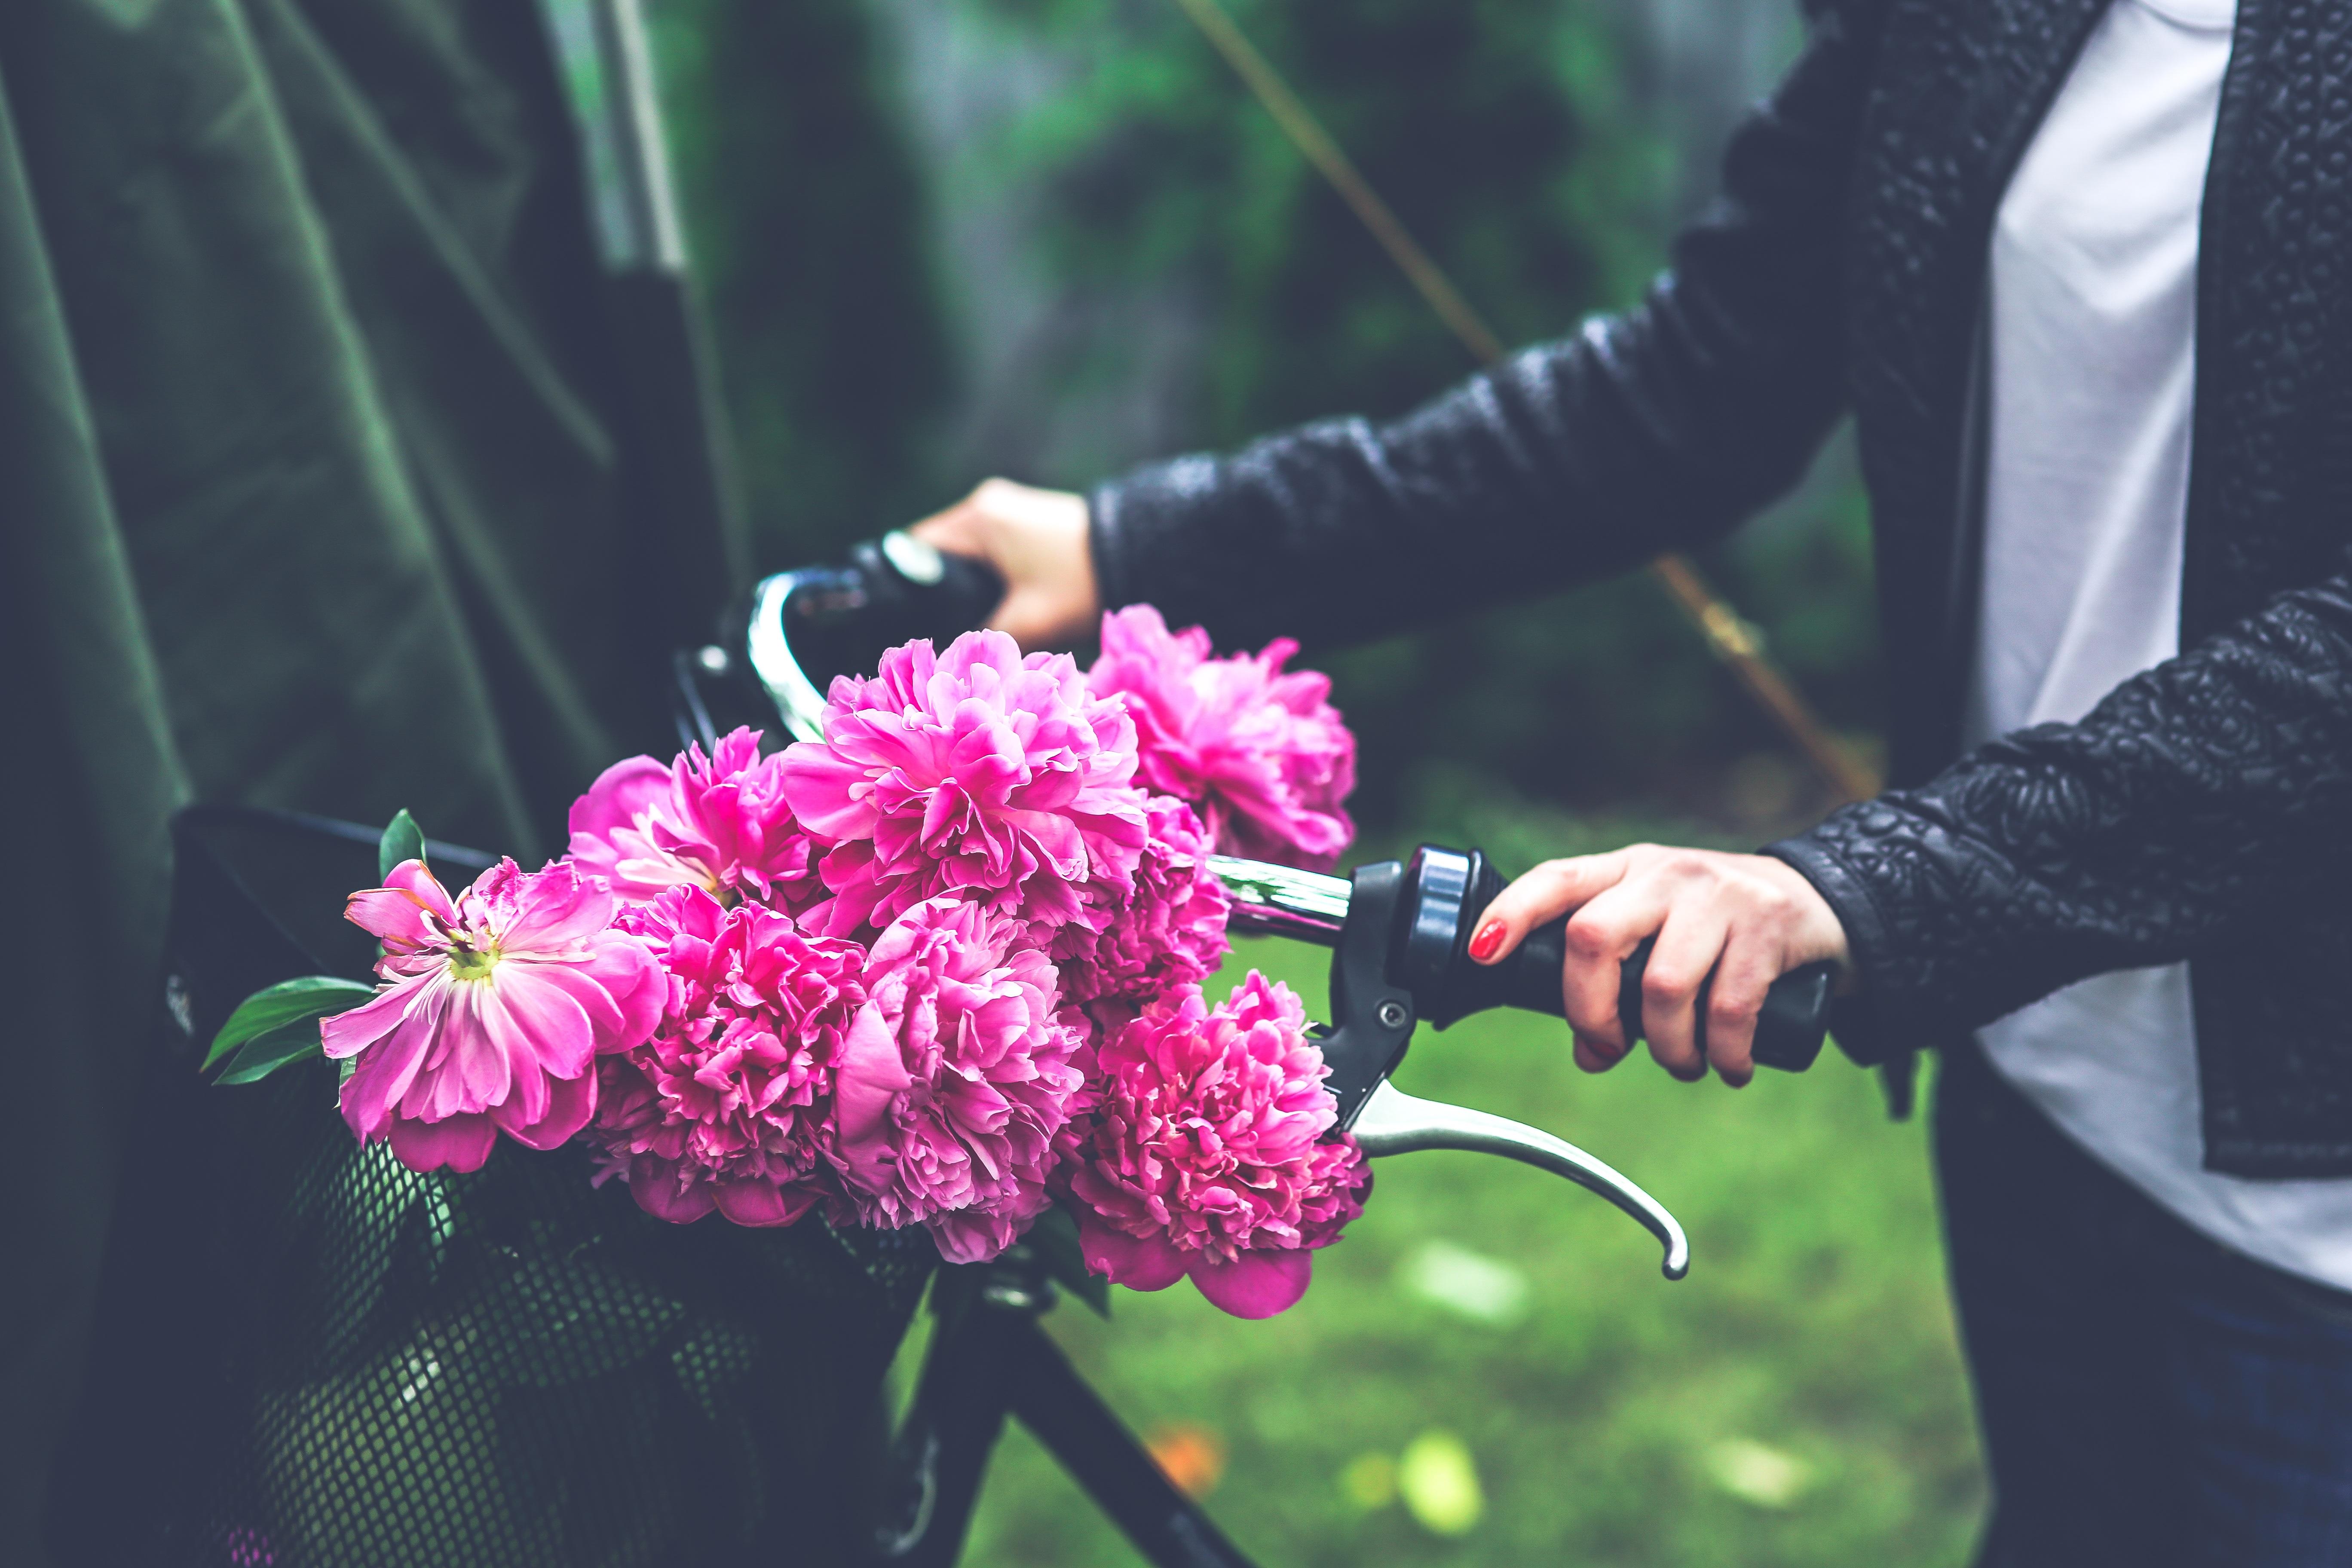 Фото букетов цветов в руках 69